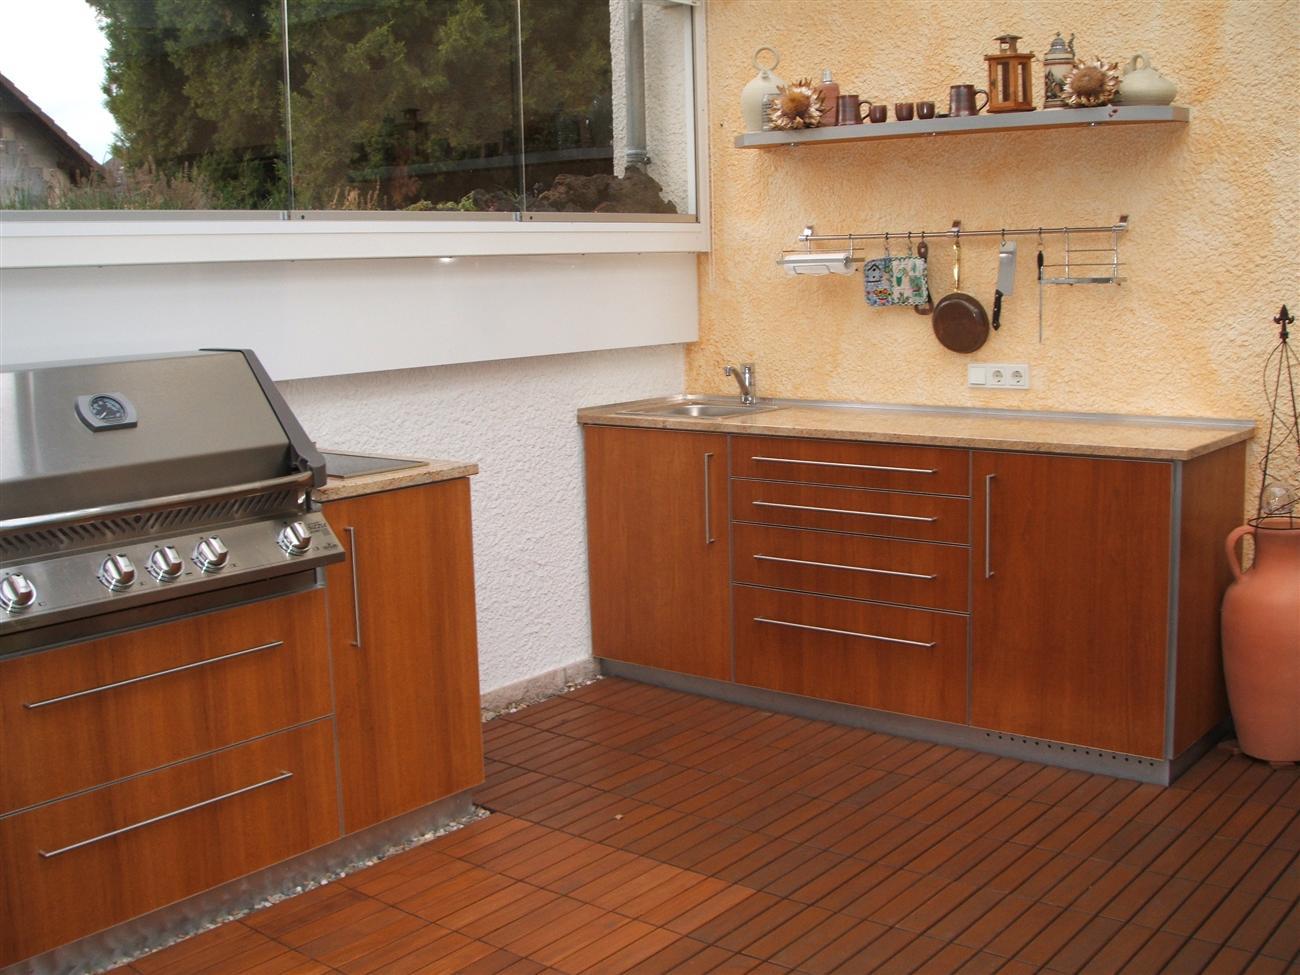 Outdoorküche Möbel Test : Outdoorküche möbel test einbau gasgrill outdoor küche möbel für